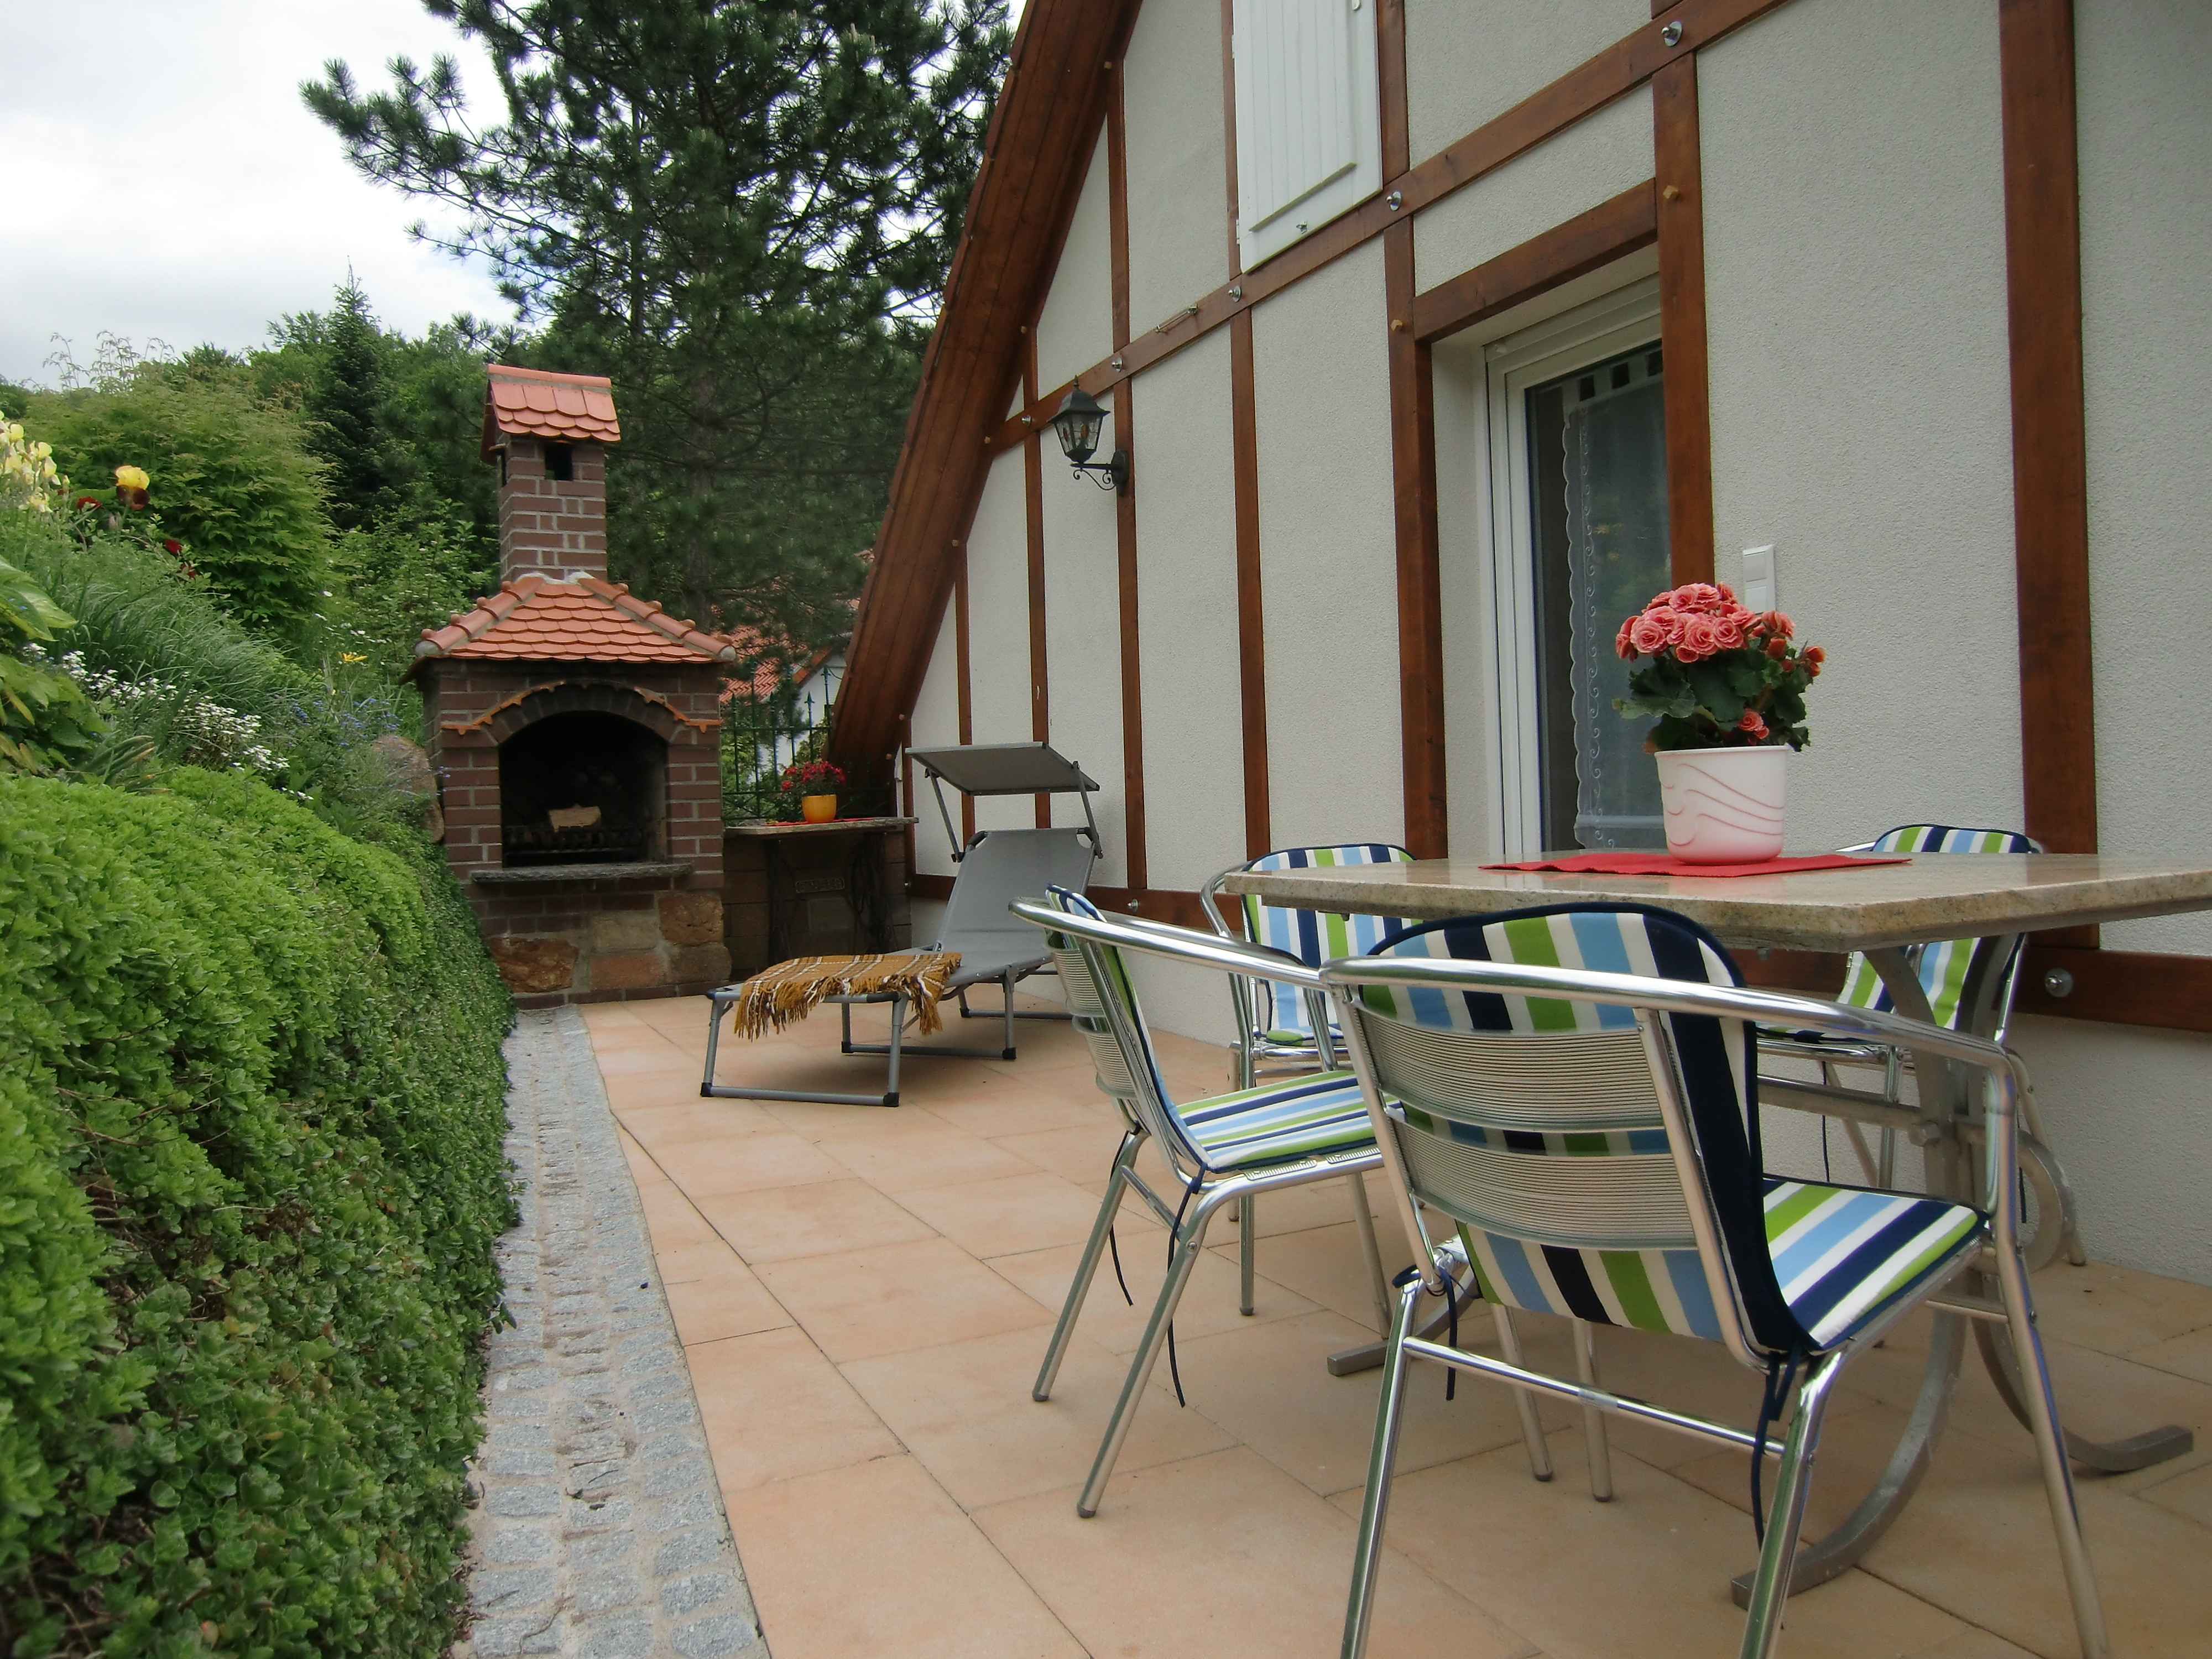 Haus am Wald in Stolberg - Terrasse mit Grill